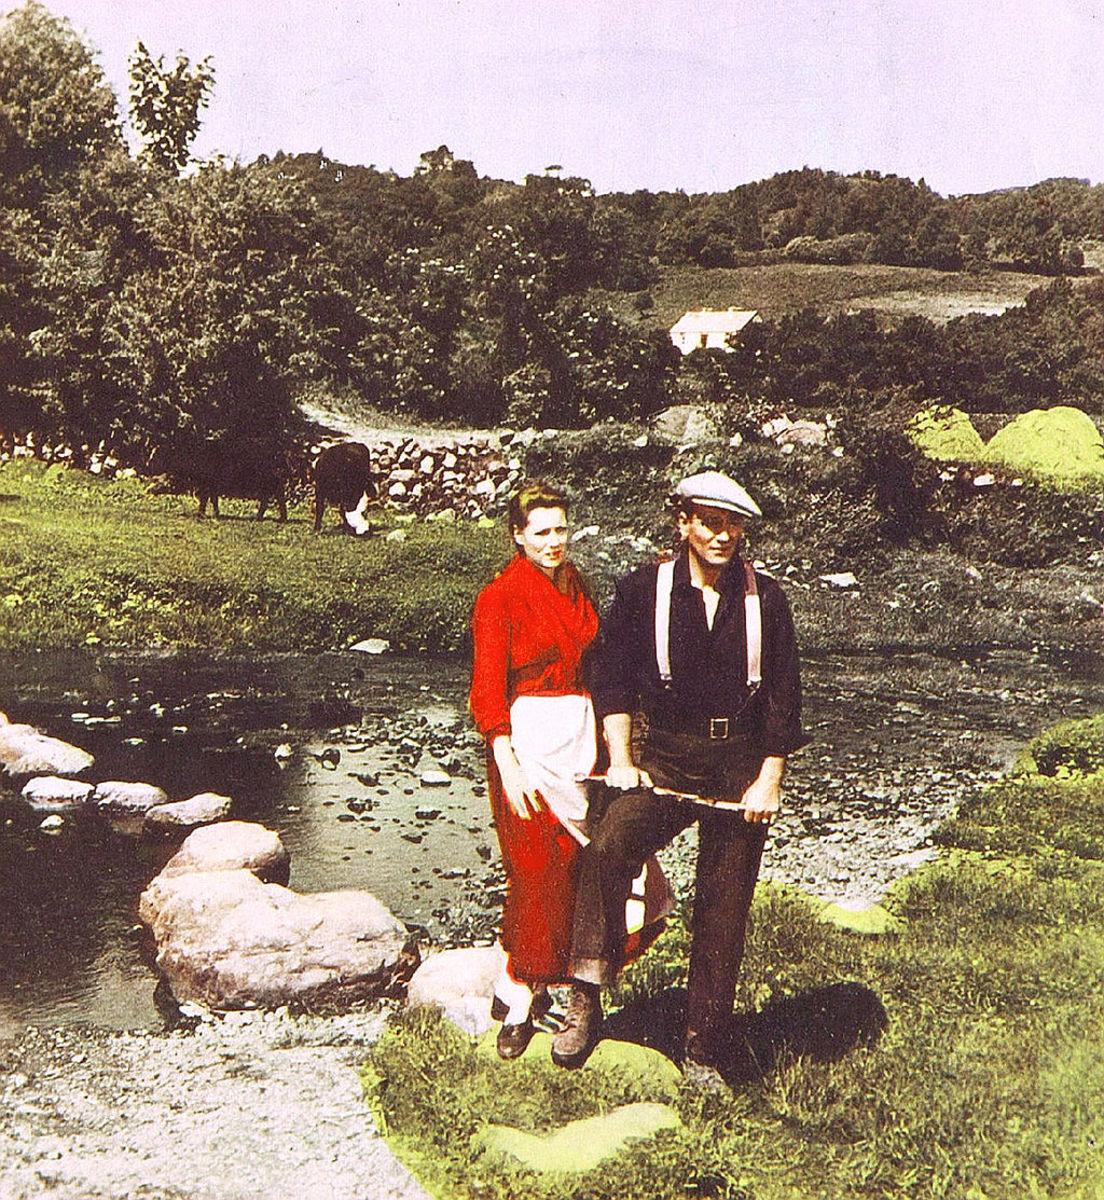 Maureen O'Hara and John Wayne in a scene from The Quiet Man.